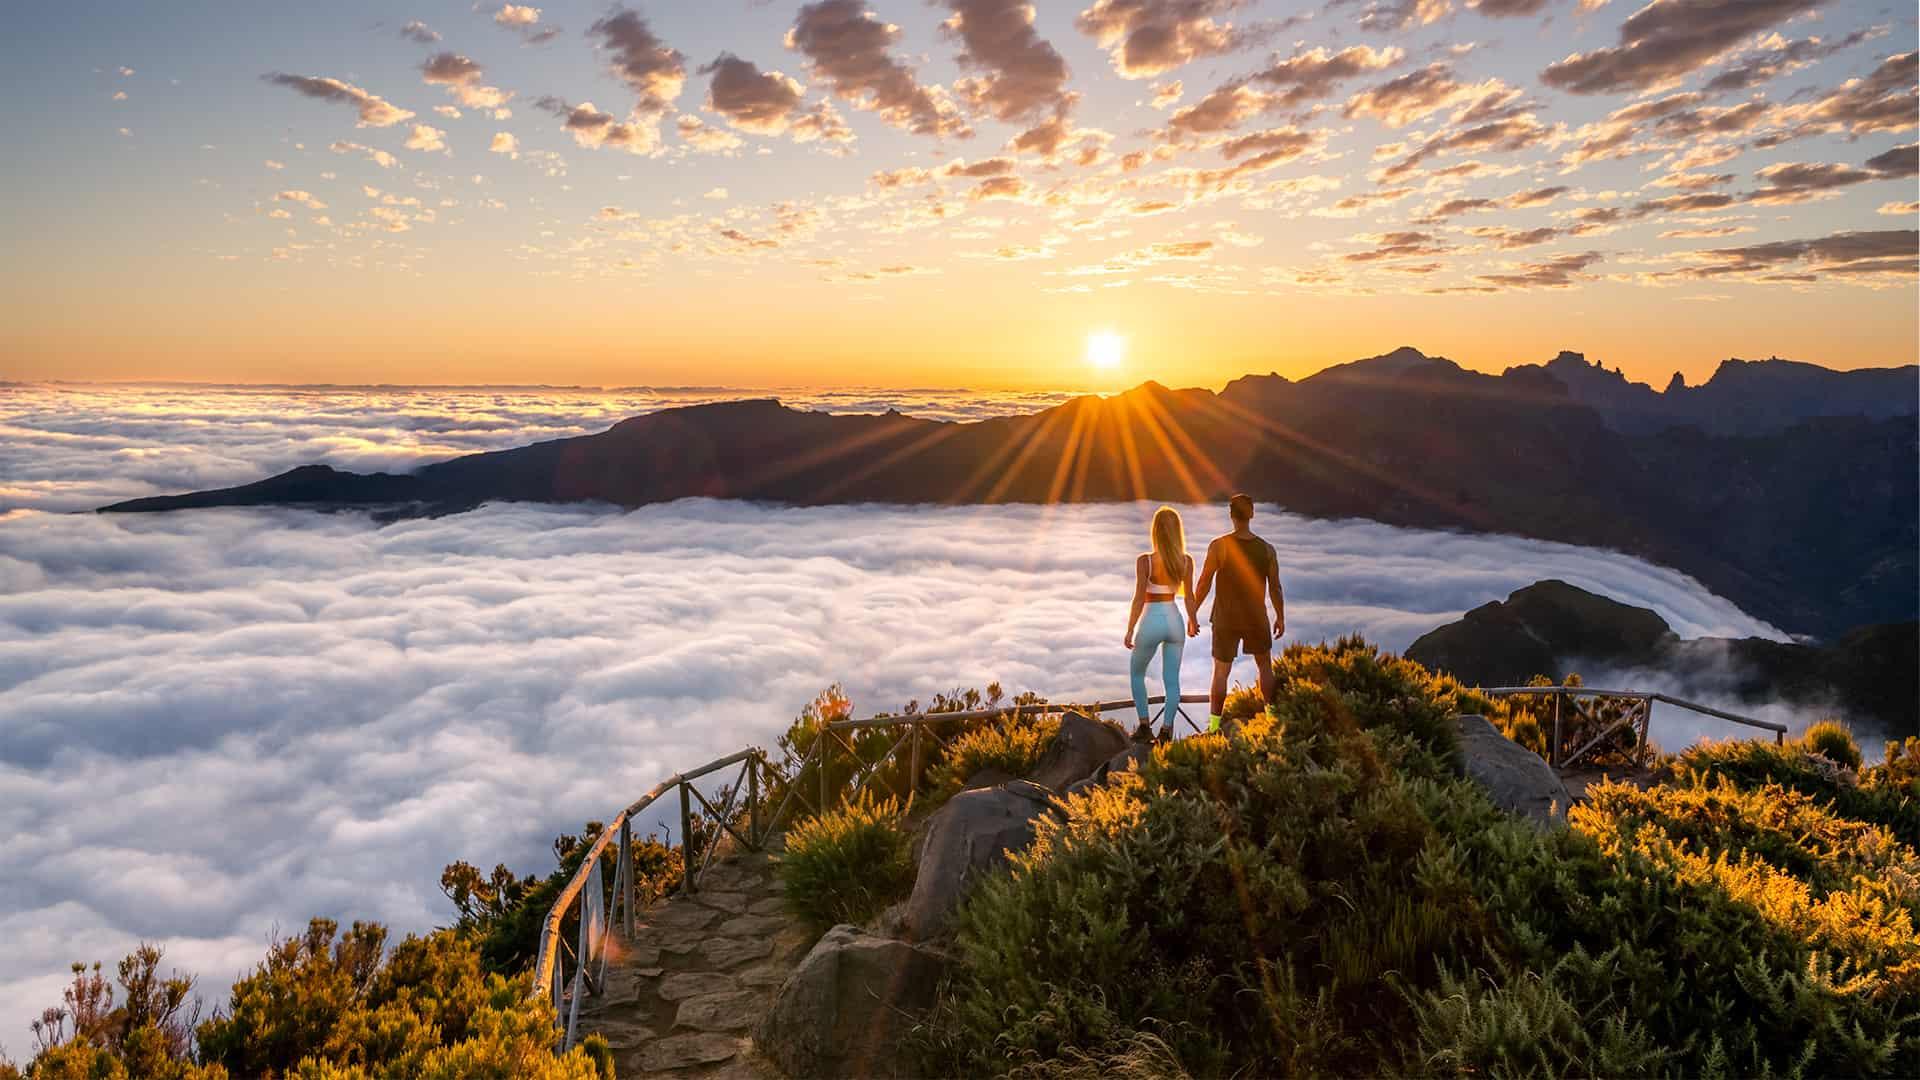 bica-da-cana-viewpoint-sunrise-DigitalTraveLCouple